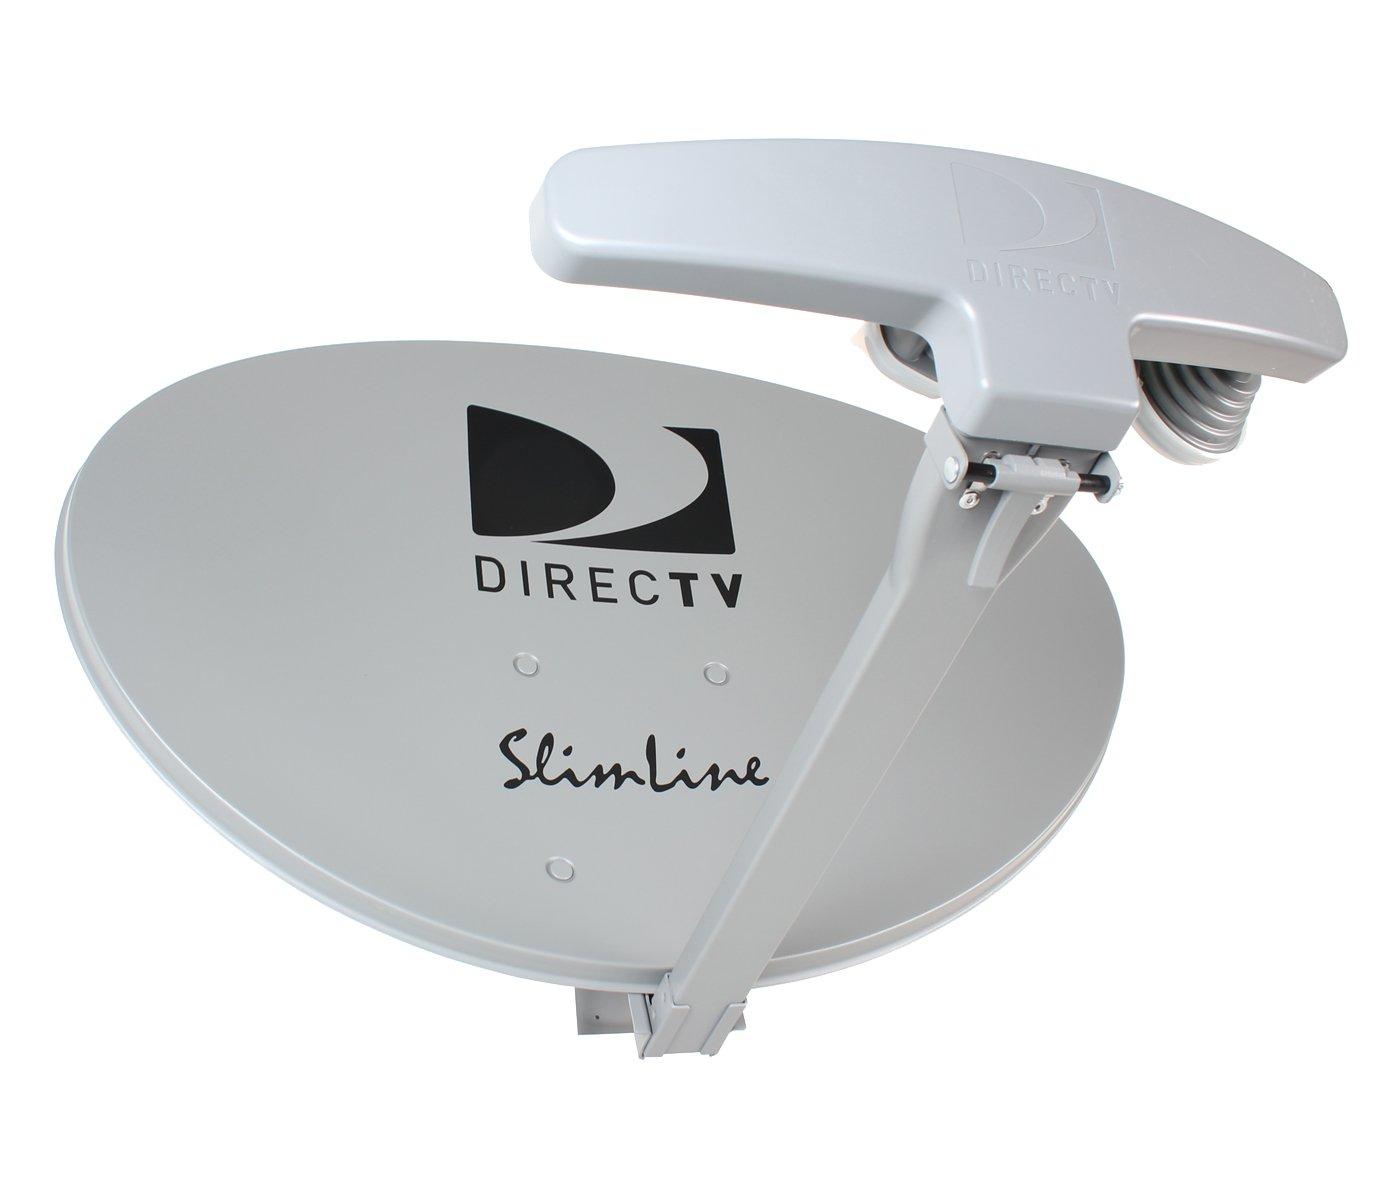 Amazon.com: DIRECTV SL5 (SL5K4NR0-02) Ka/ku Slim Line Dish Antenna ...